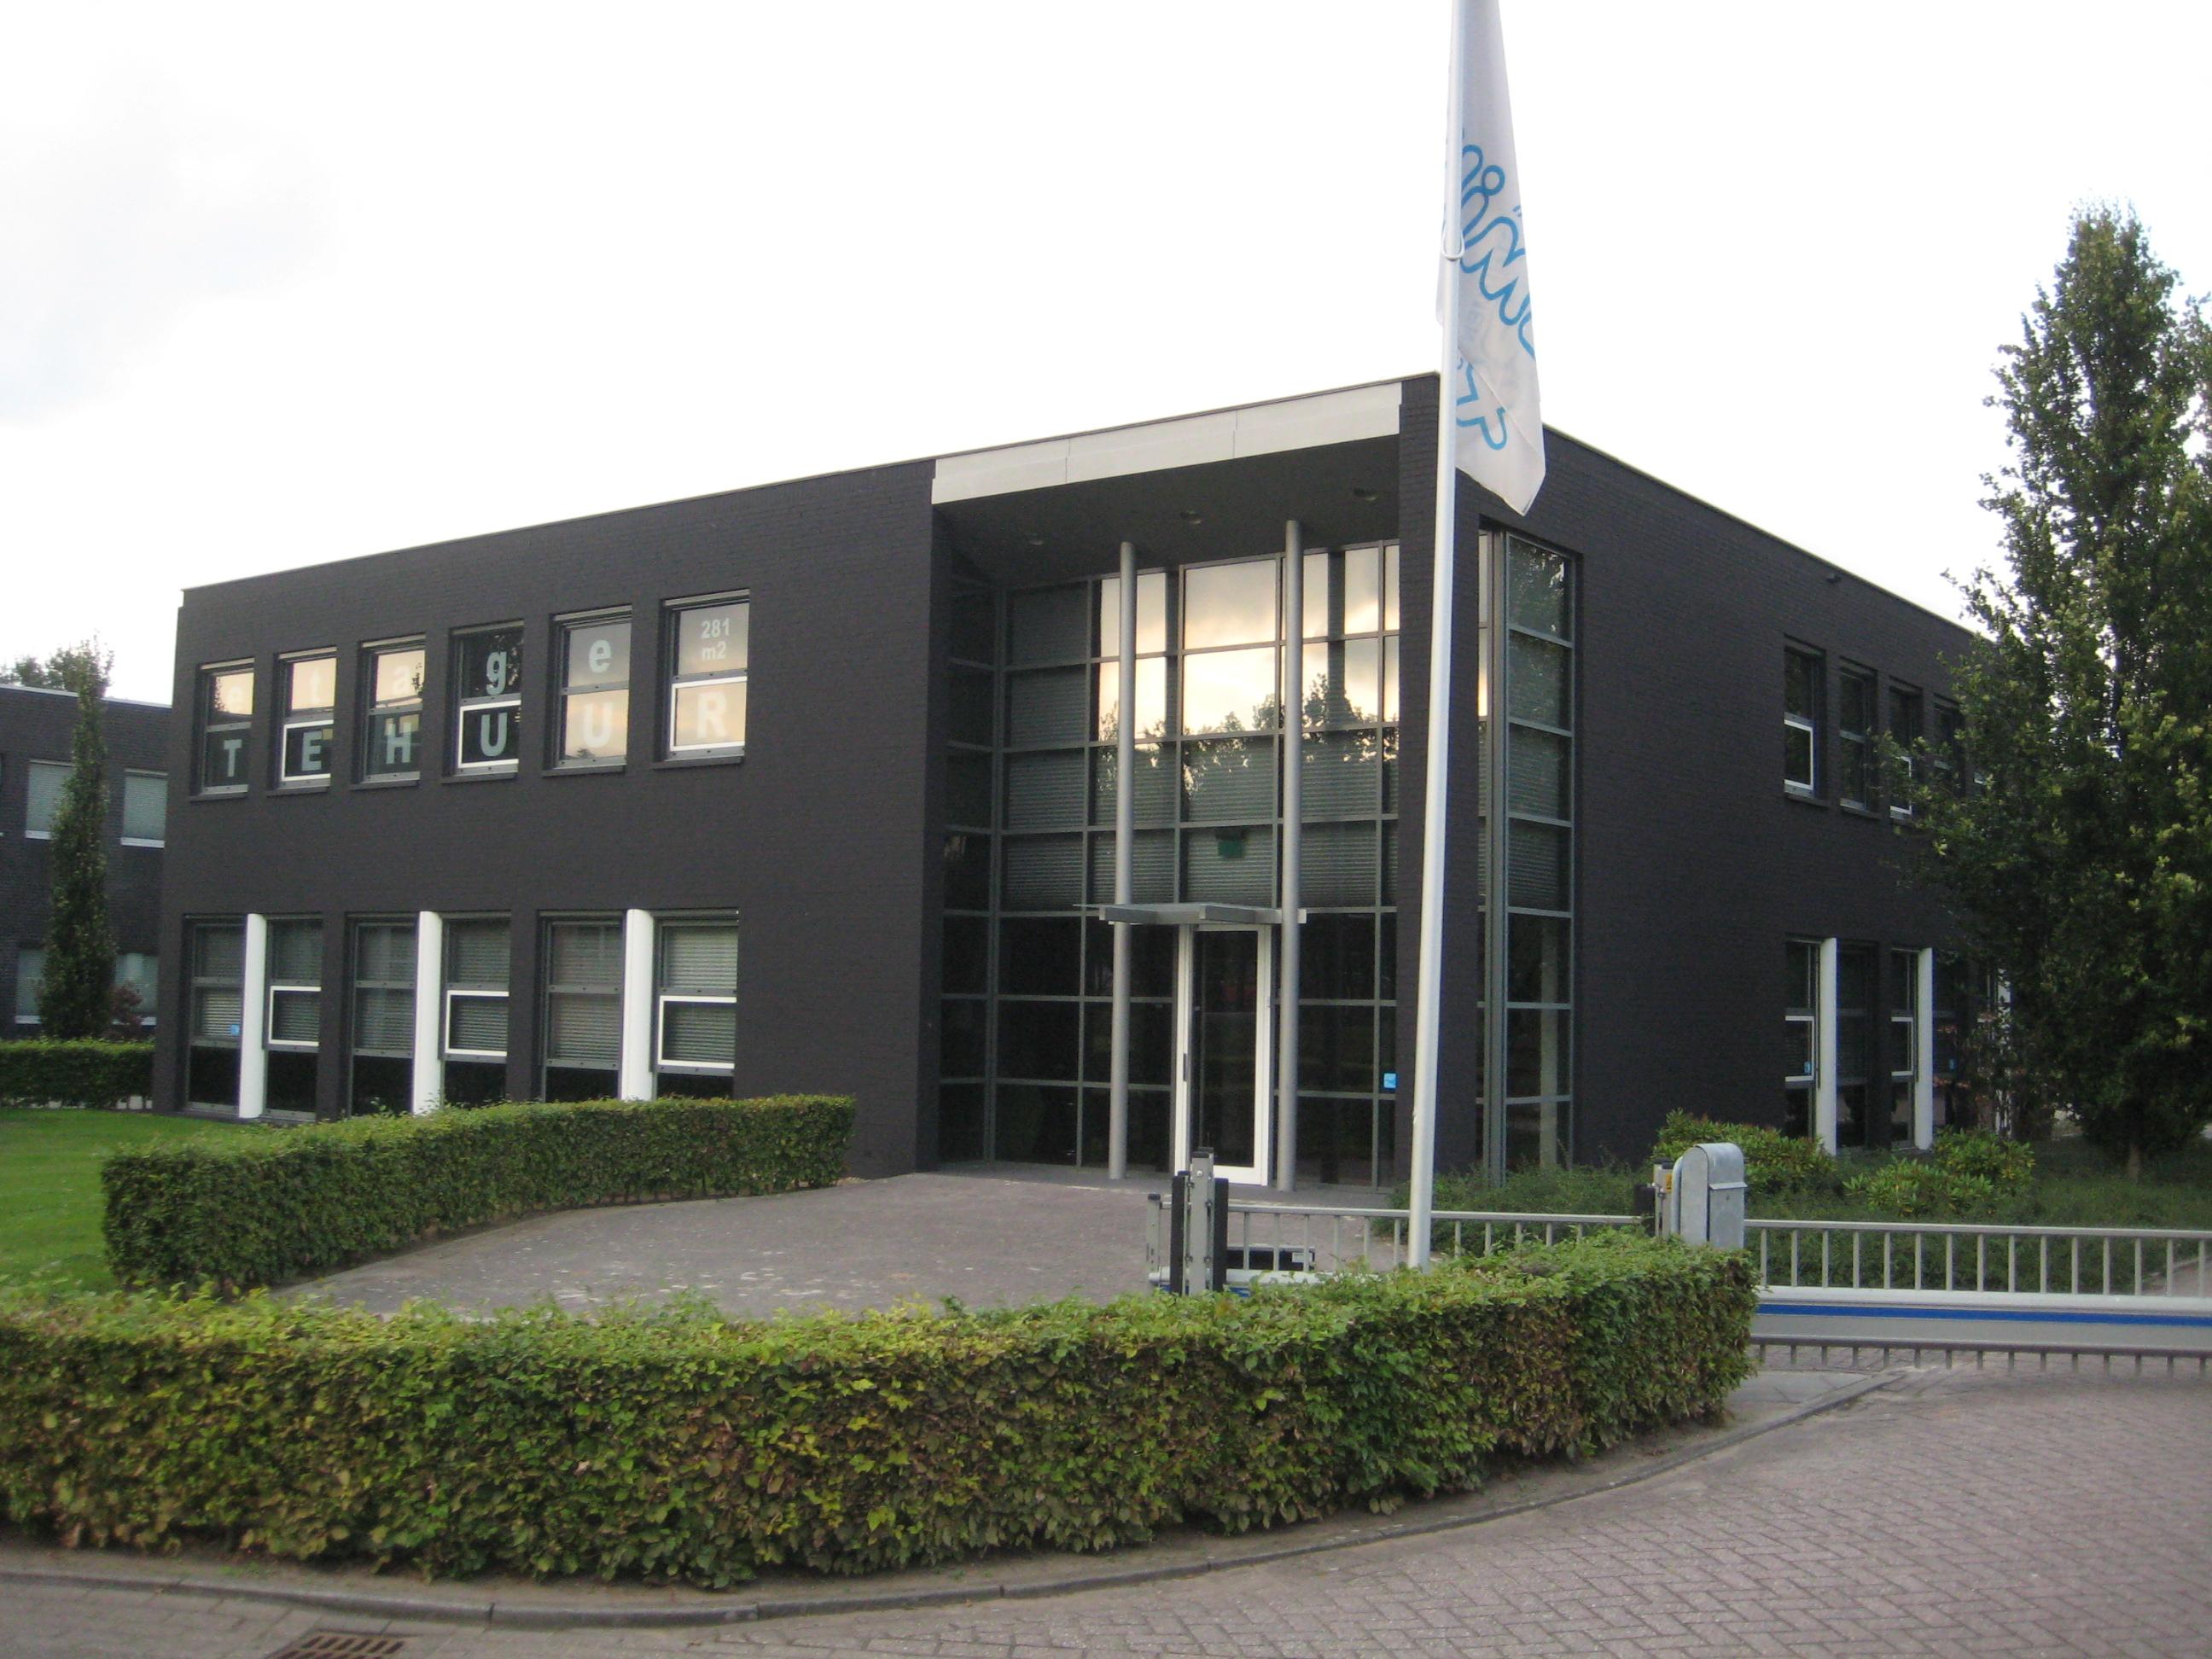 Gullimex Borne 2012 022